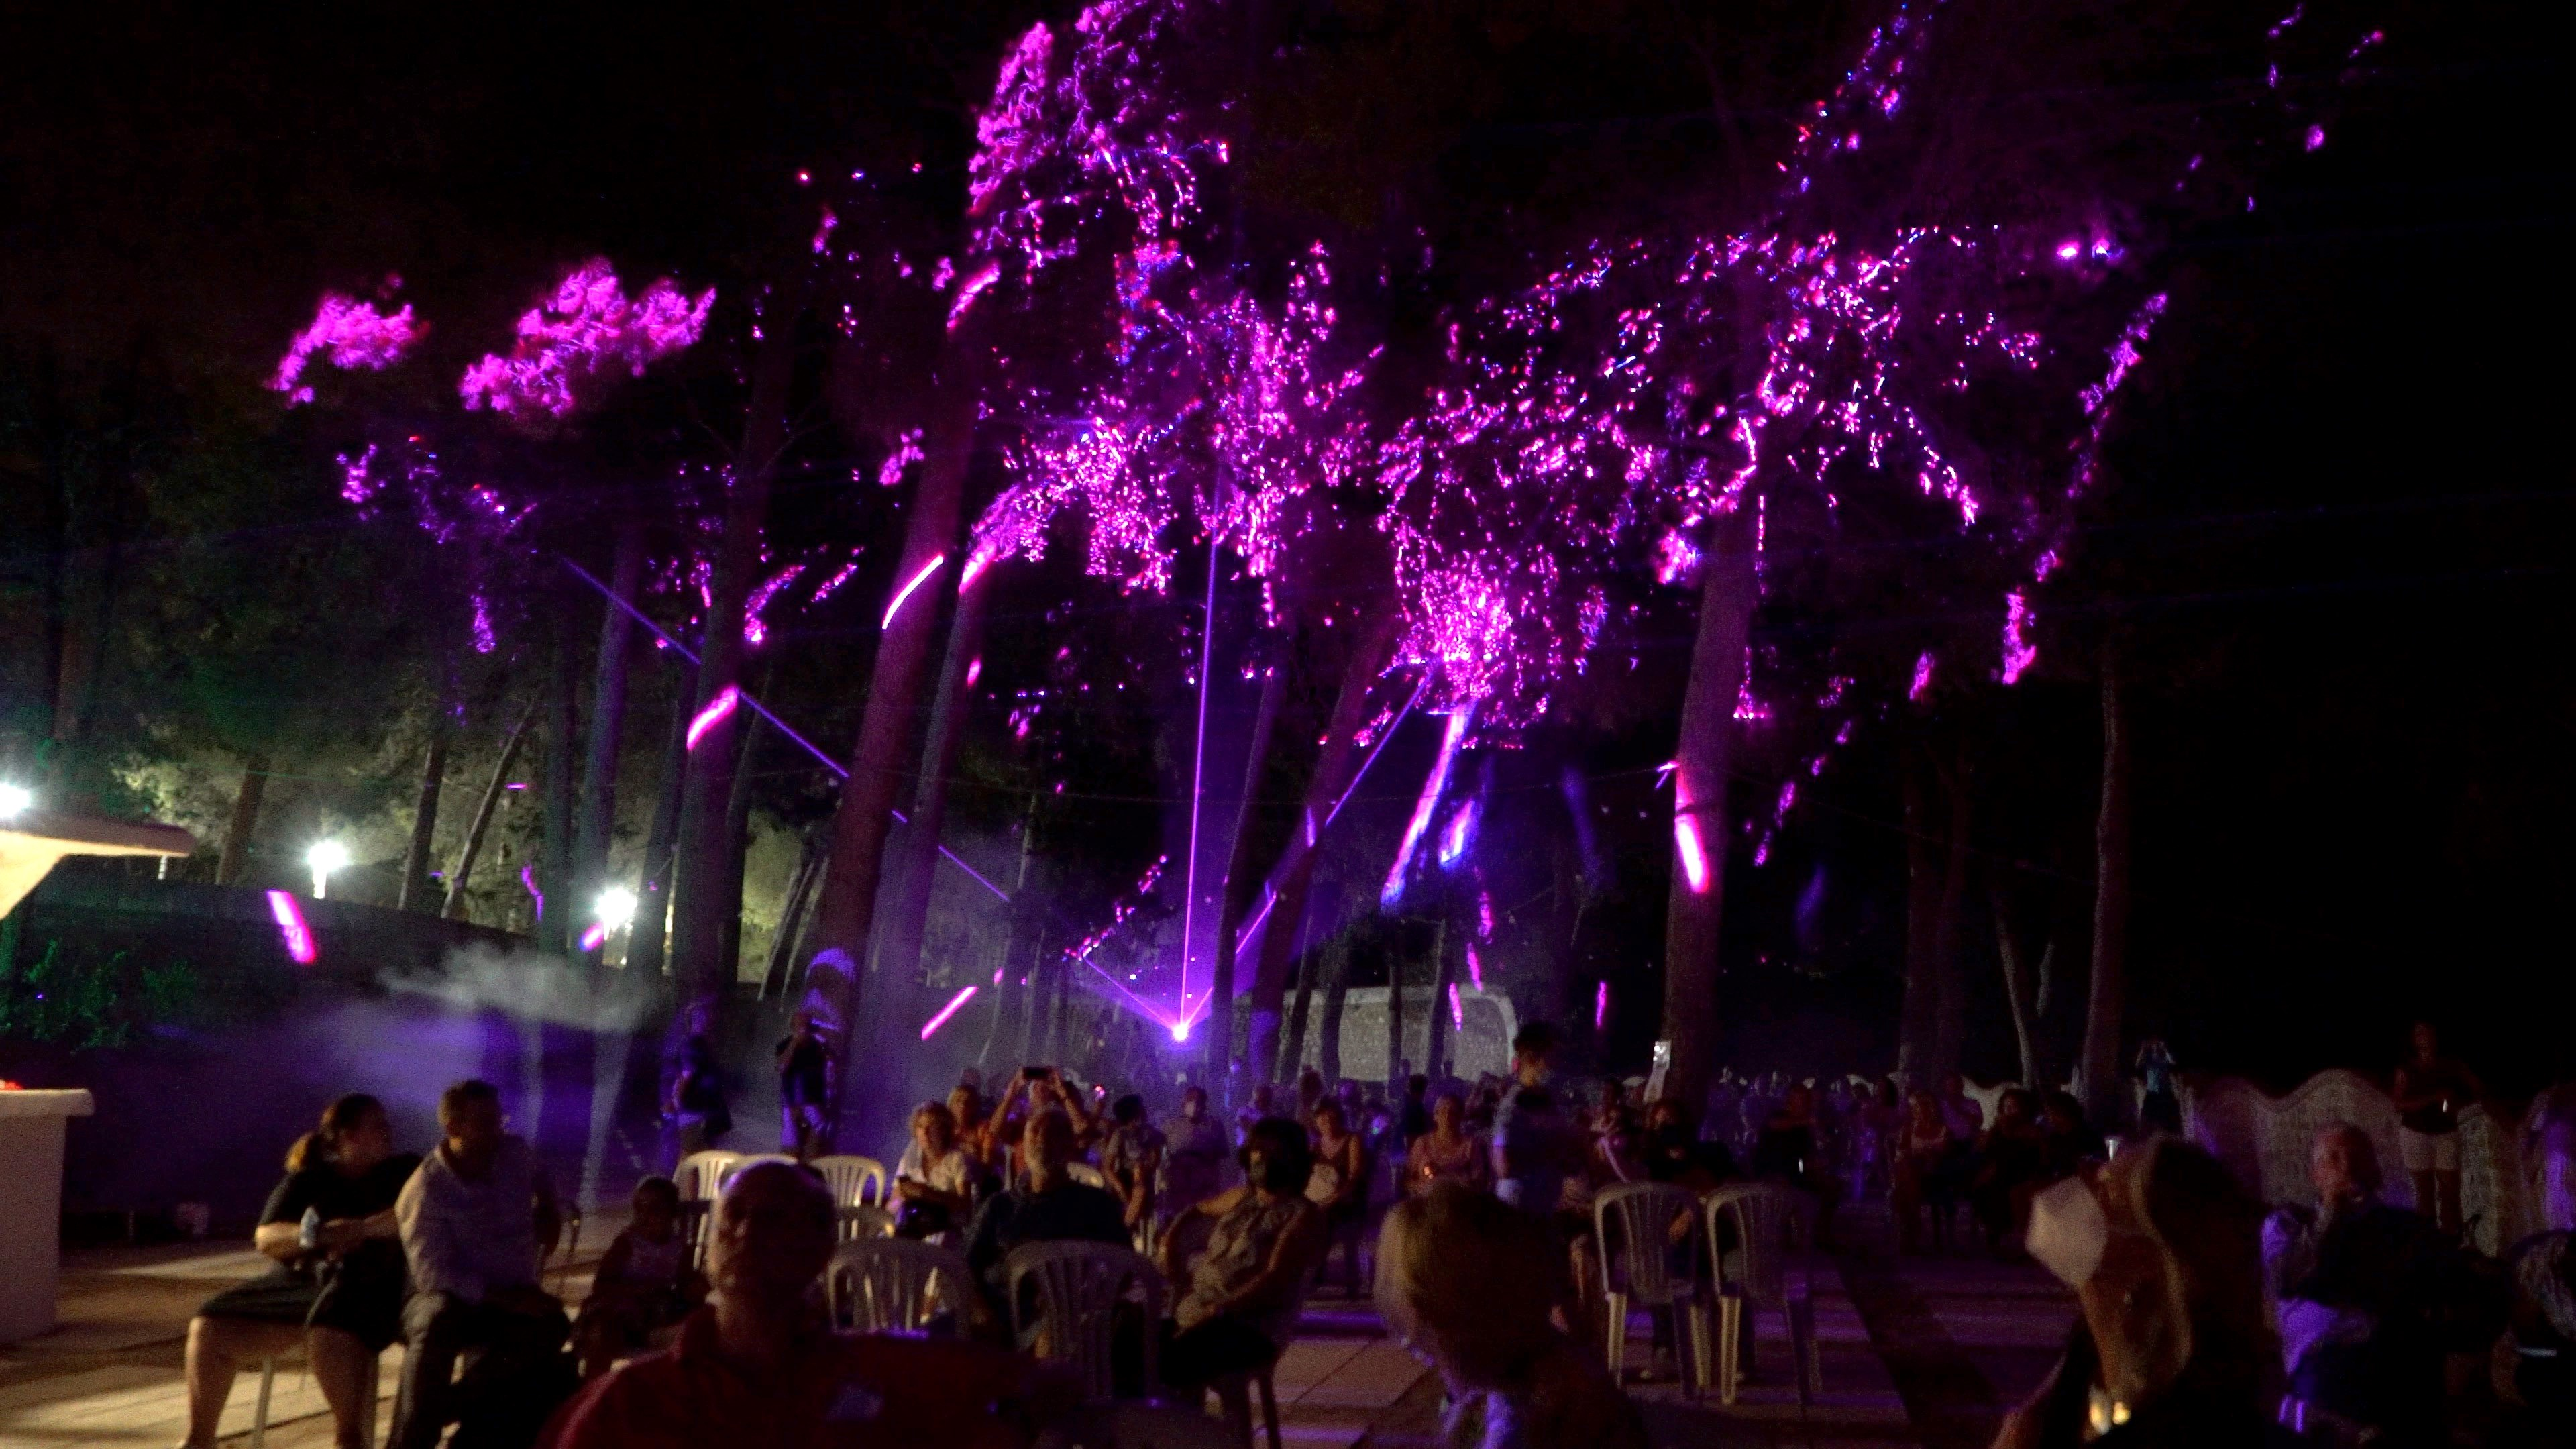 Espectacular show de luces en el Geoparque